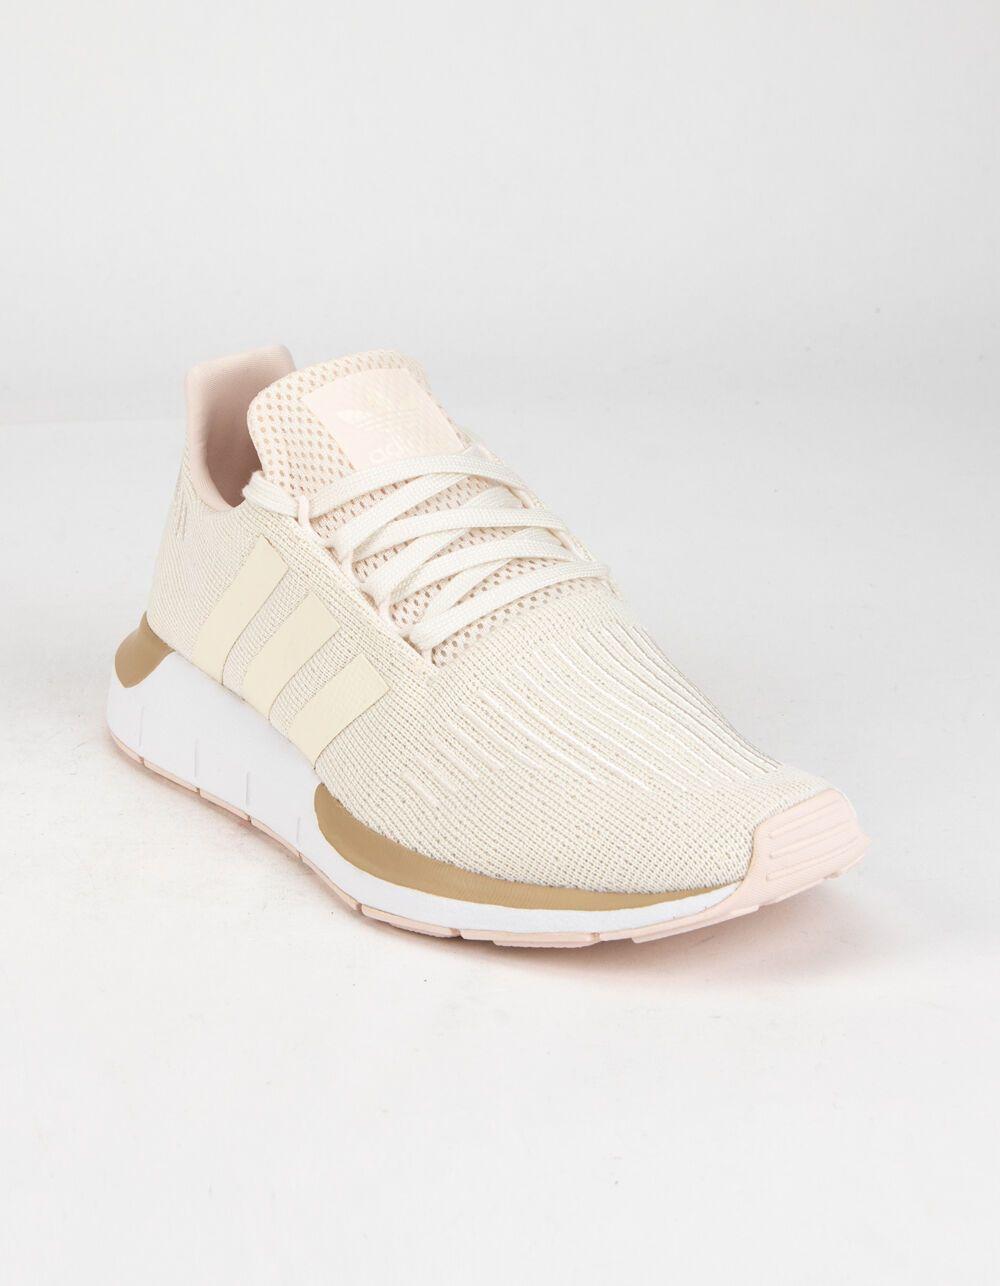 Adidas Swift Run Womens Cloud White Shoes Adidas Shoes Women Womens Workout Shoes White Shoes